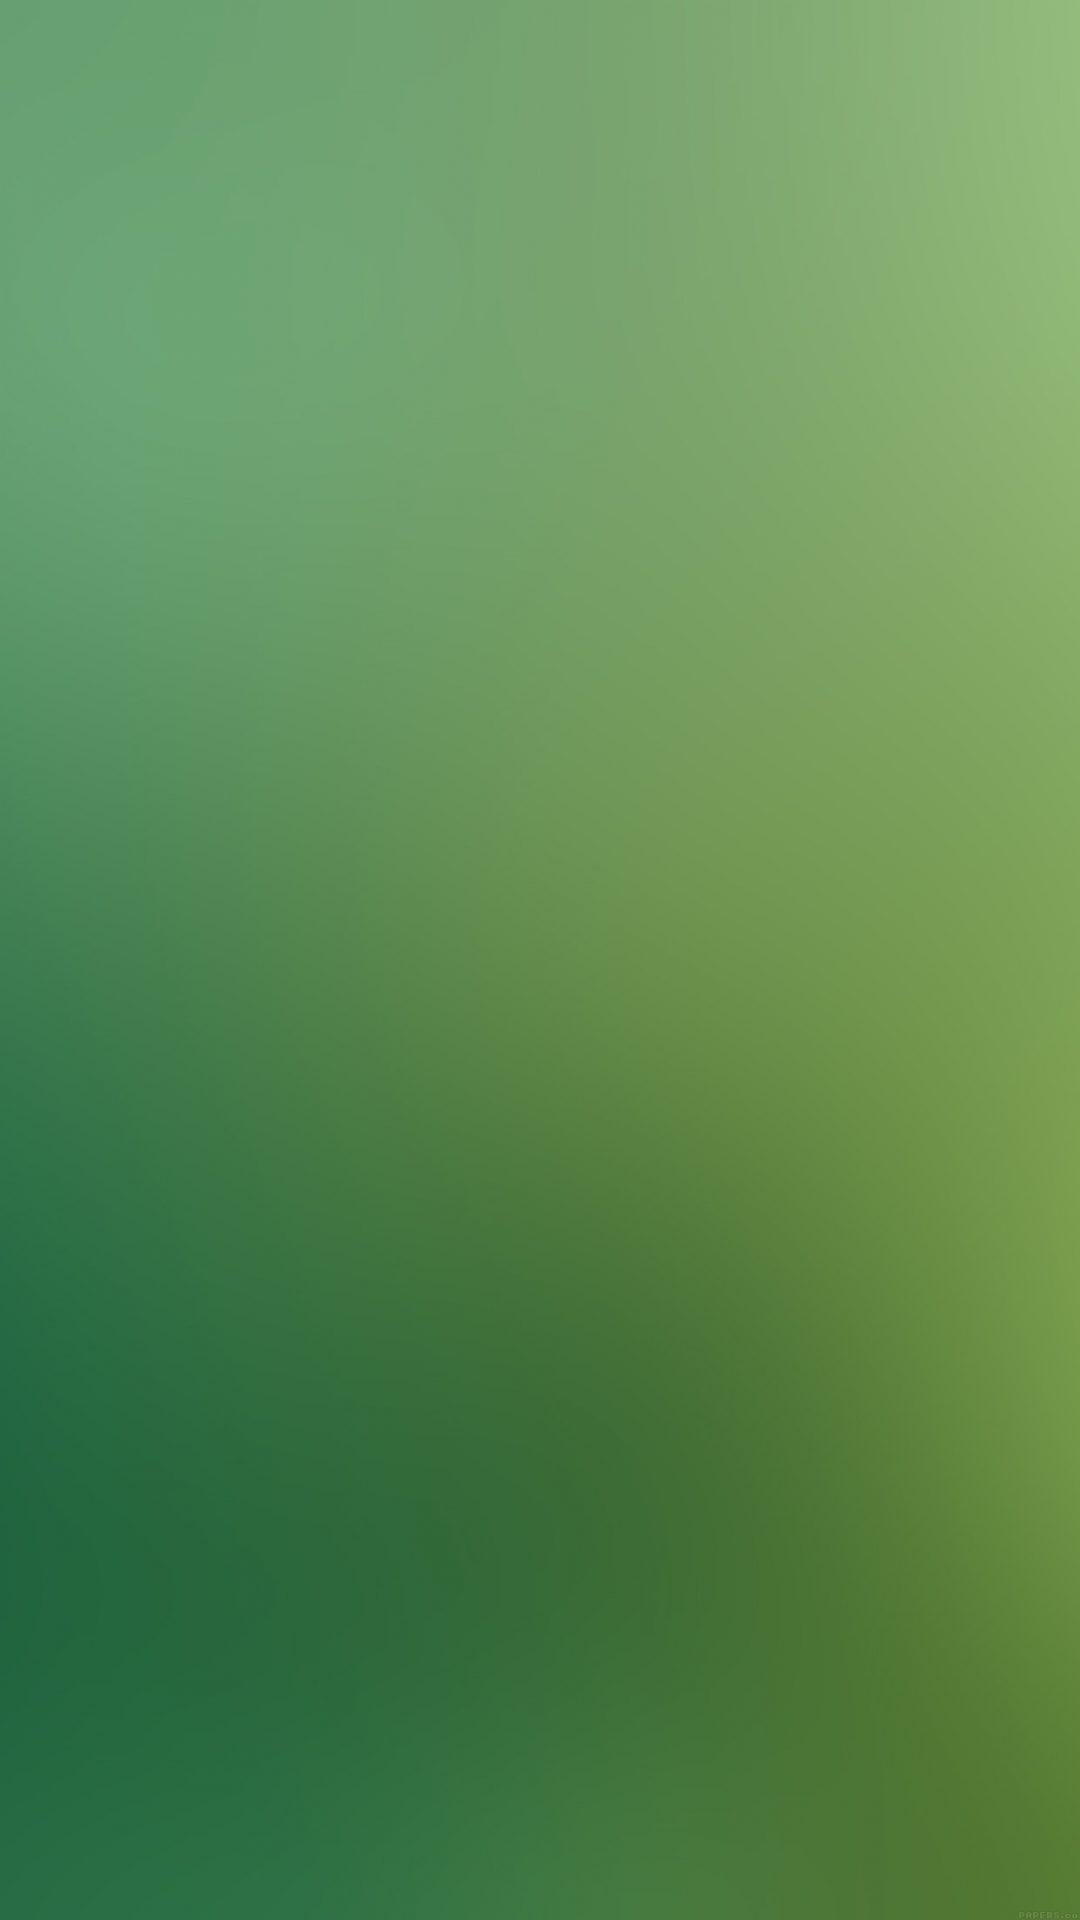 Green Peace Love Gradation Blur